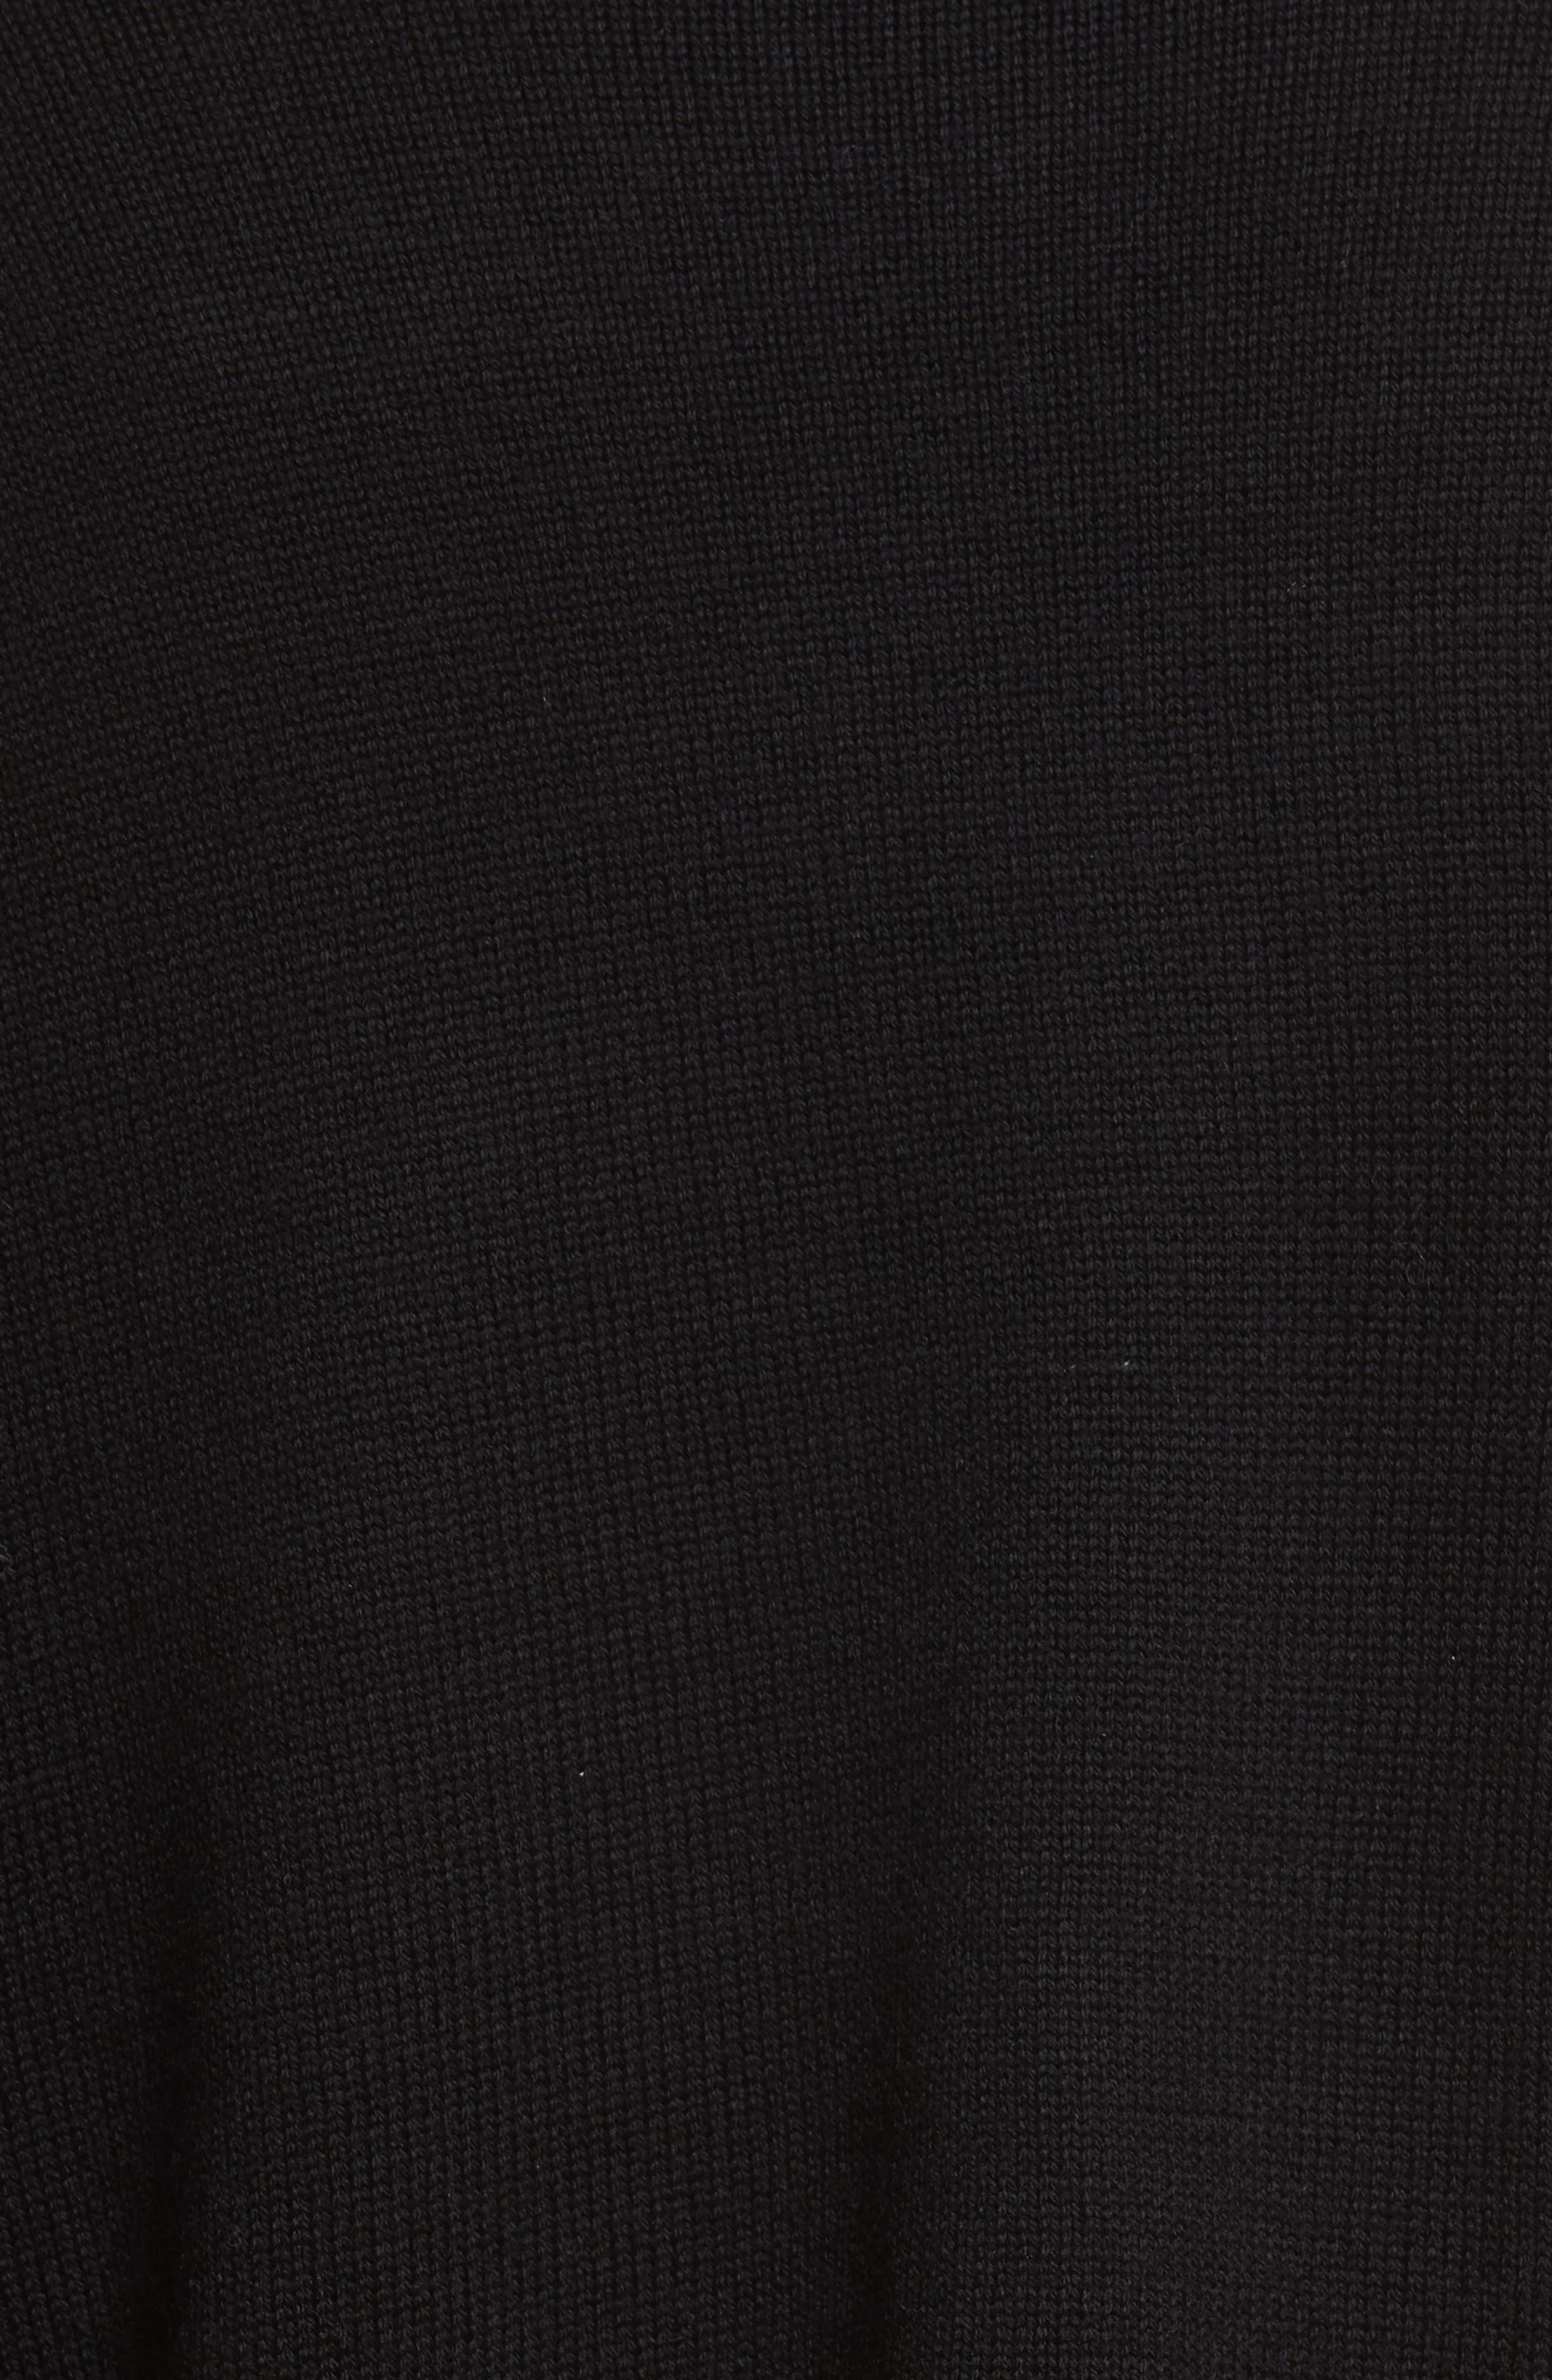 Parola Sweater,                             Alternate thumbnail 5, color,                             001